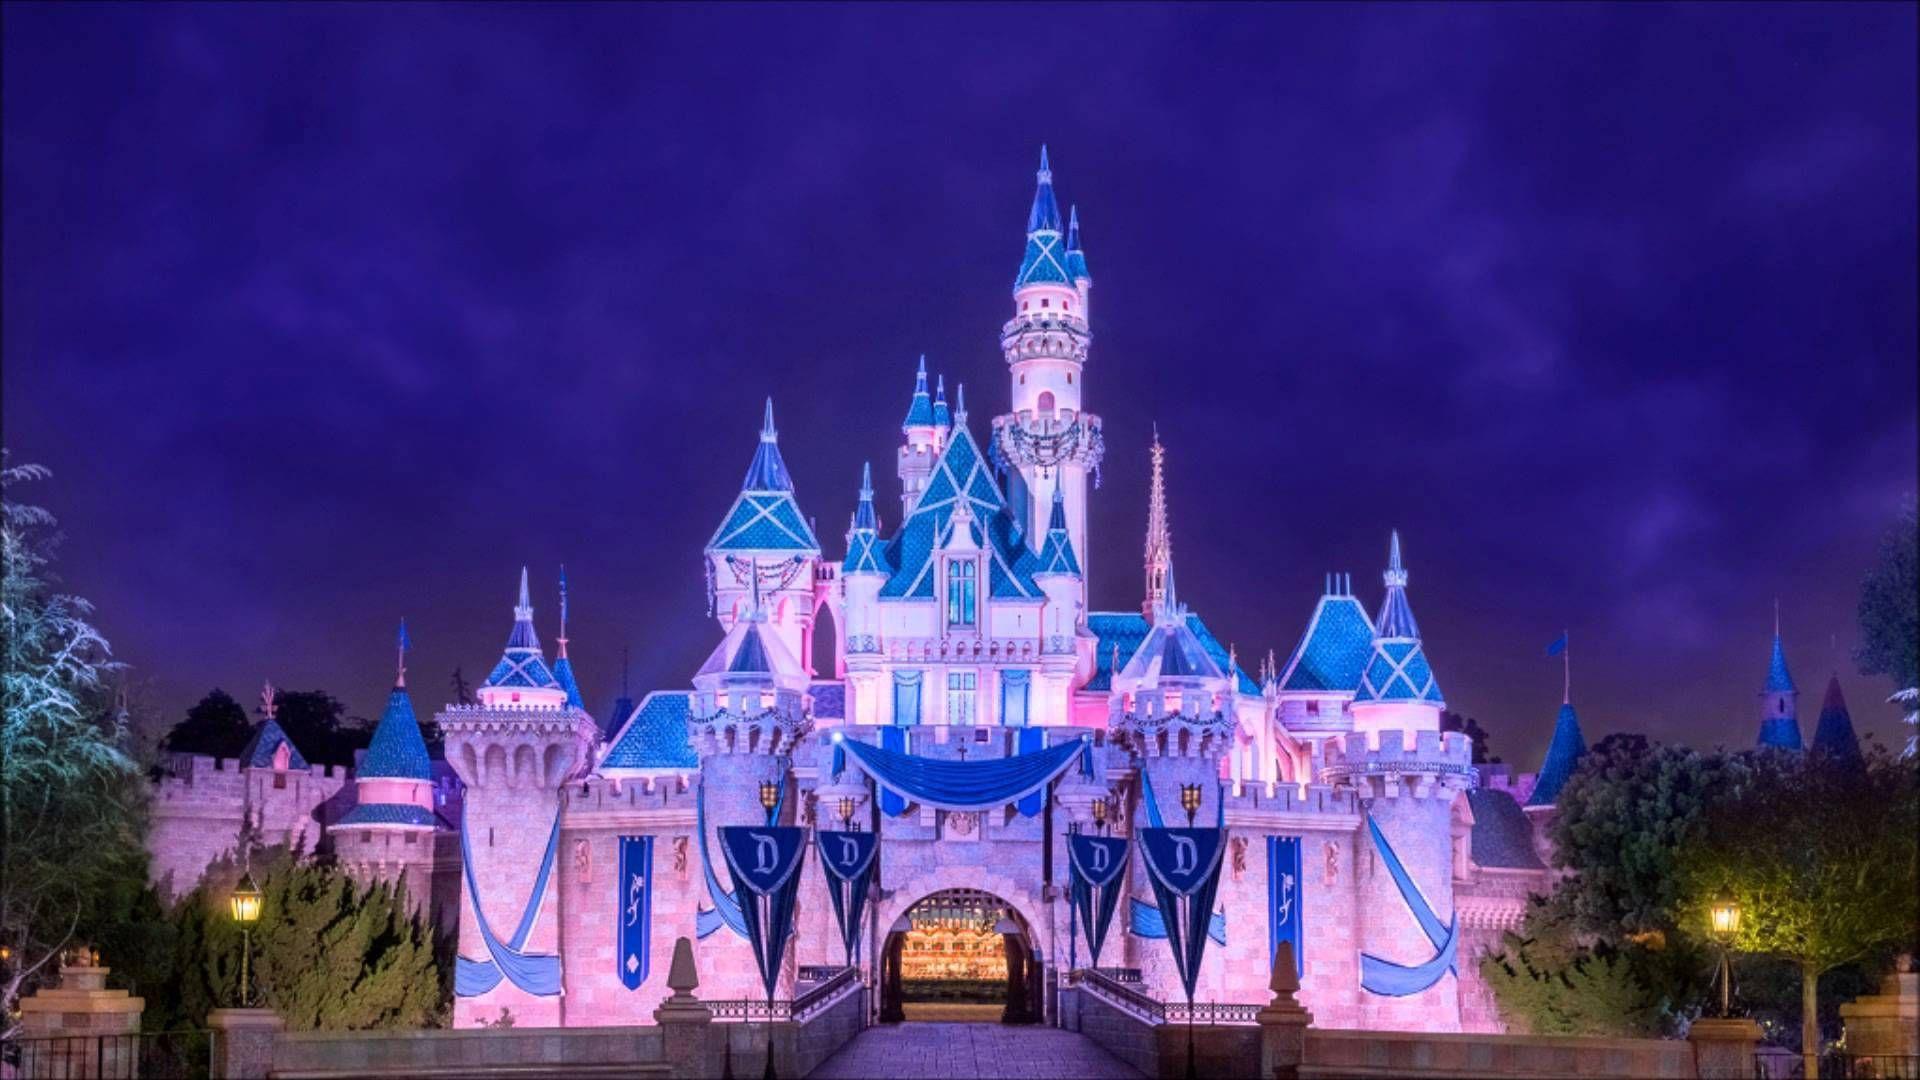 Disney World Castle Wallpaper Posted By Ethan Walker